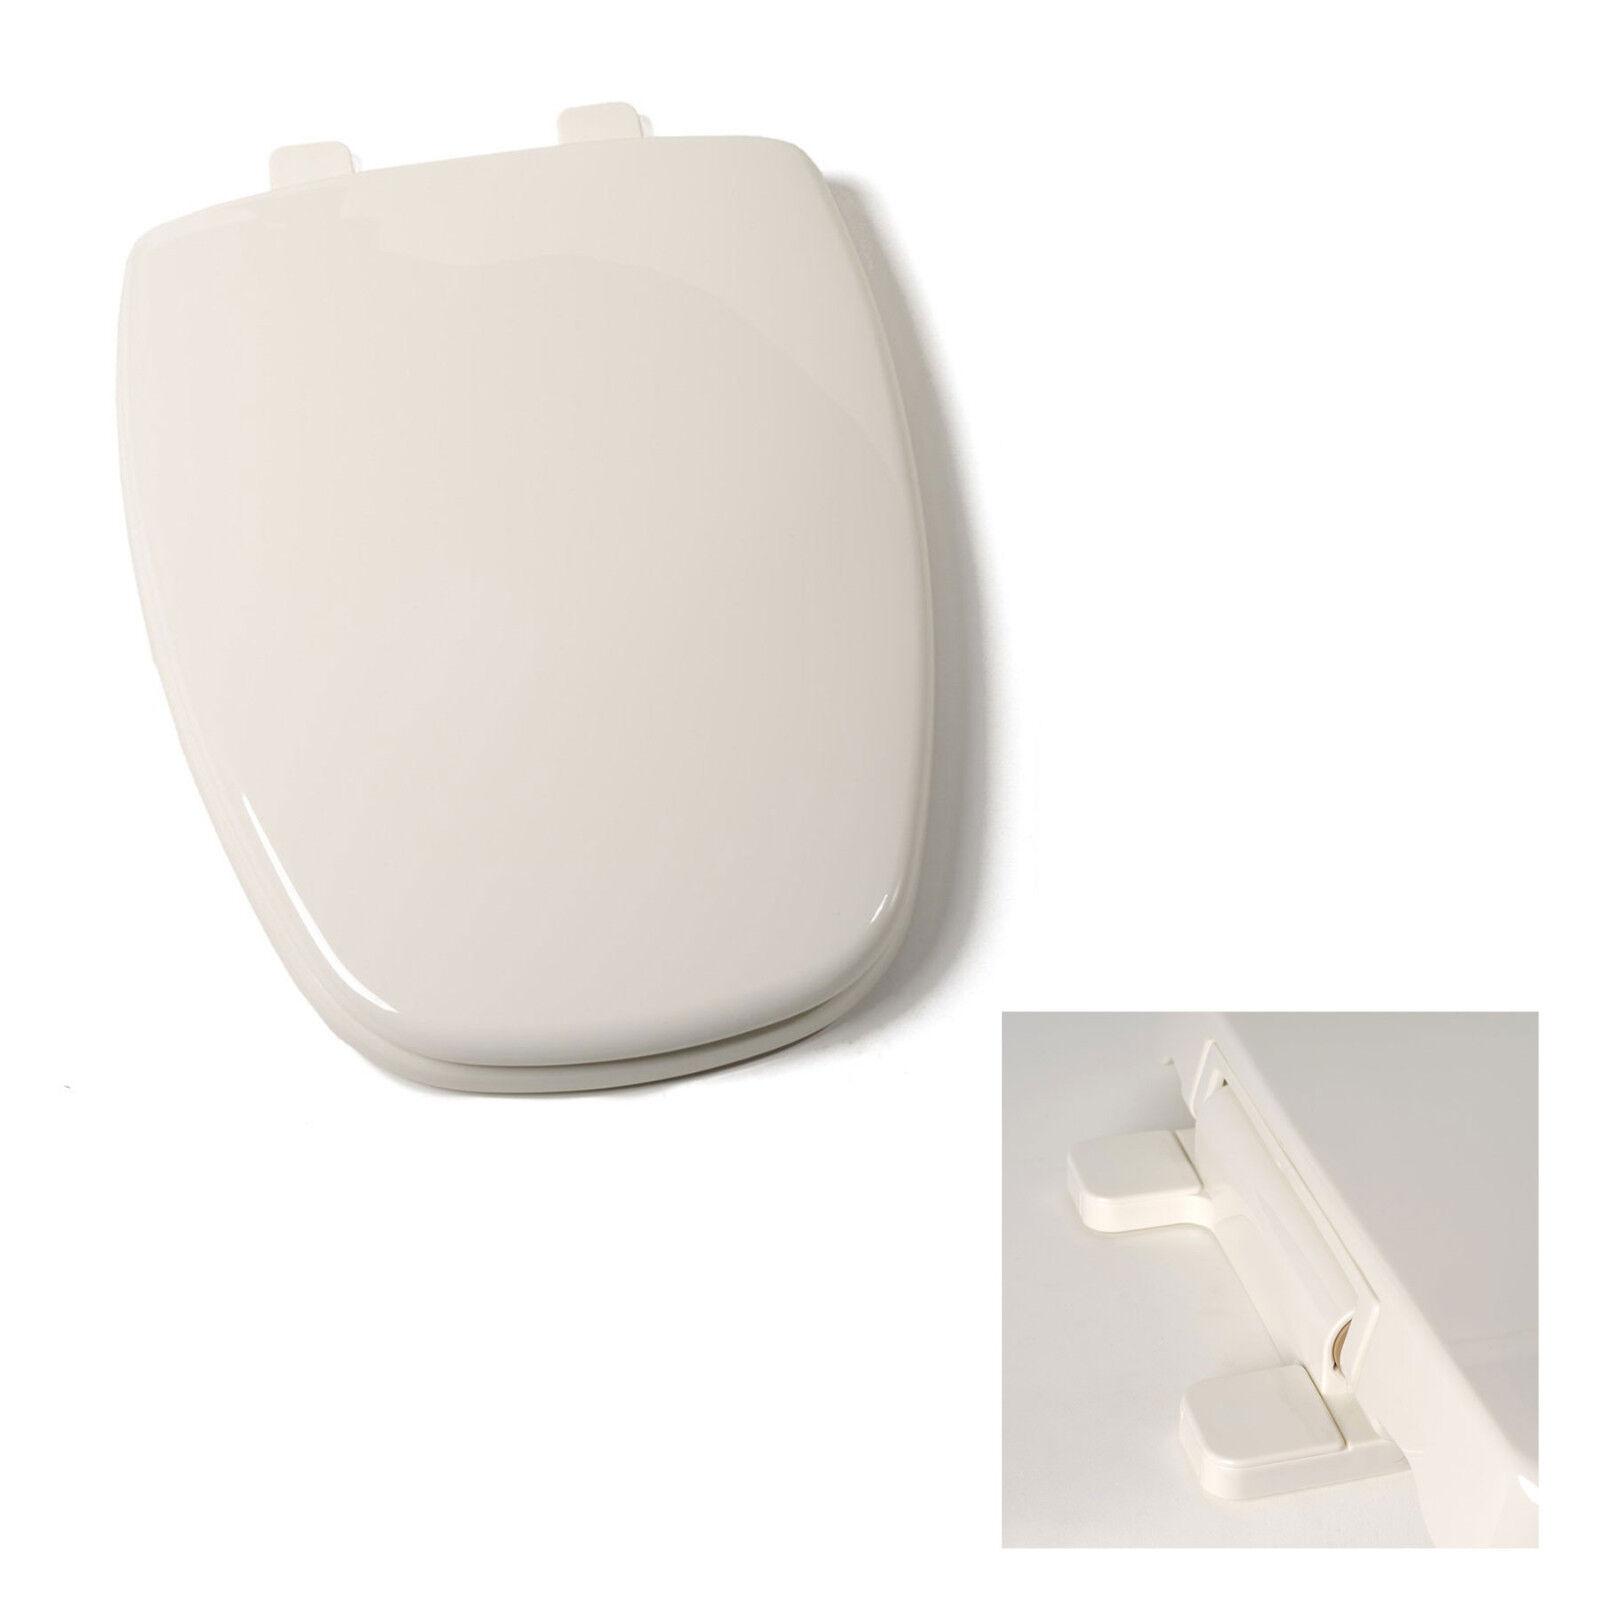 Deluxe Plastic Square Slow-Close Bone Elongated Toilet Seat for Eljer Toilets Bath